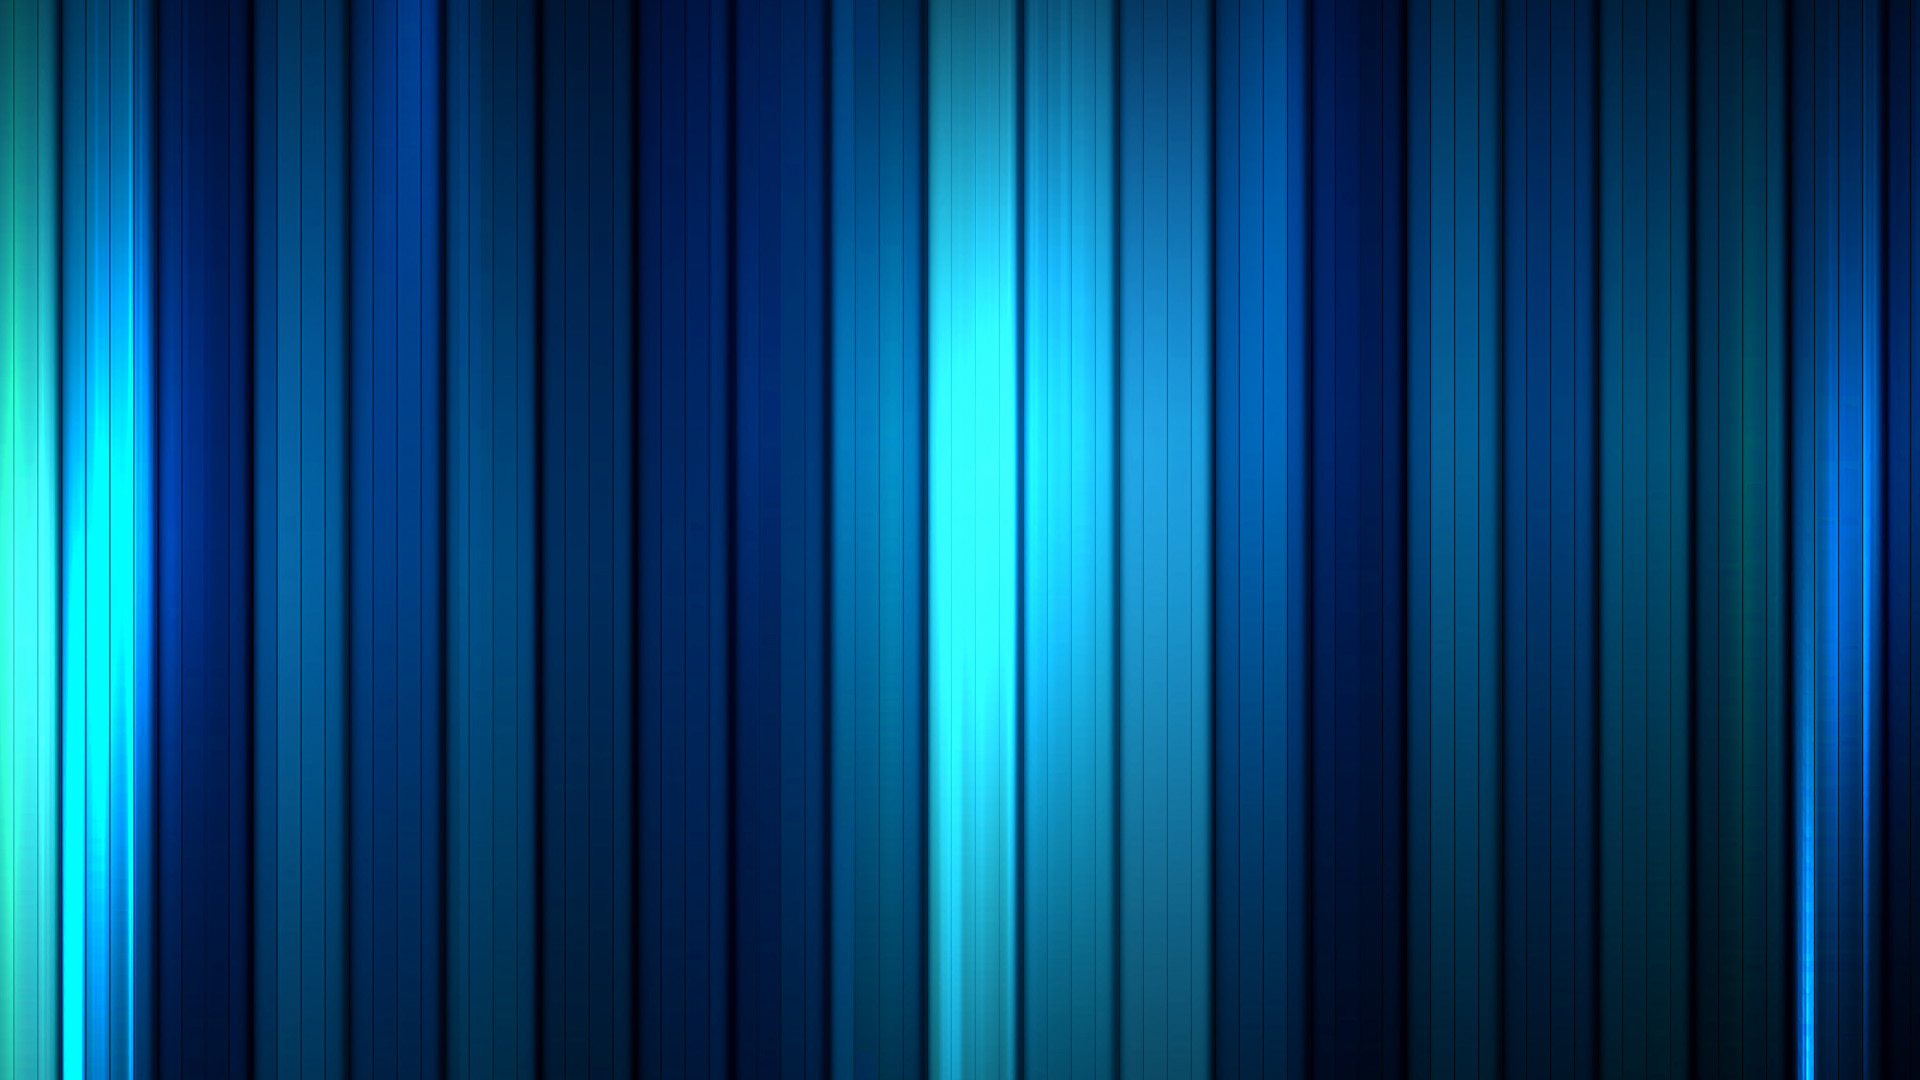 50 Fresh HD Wallpapers 1920x1080